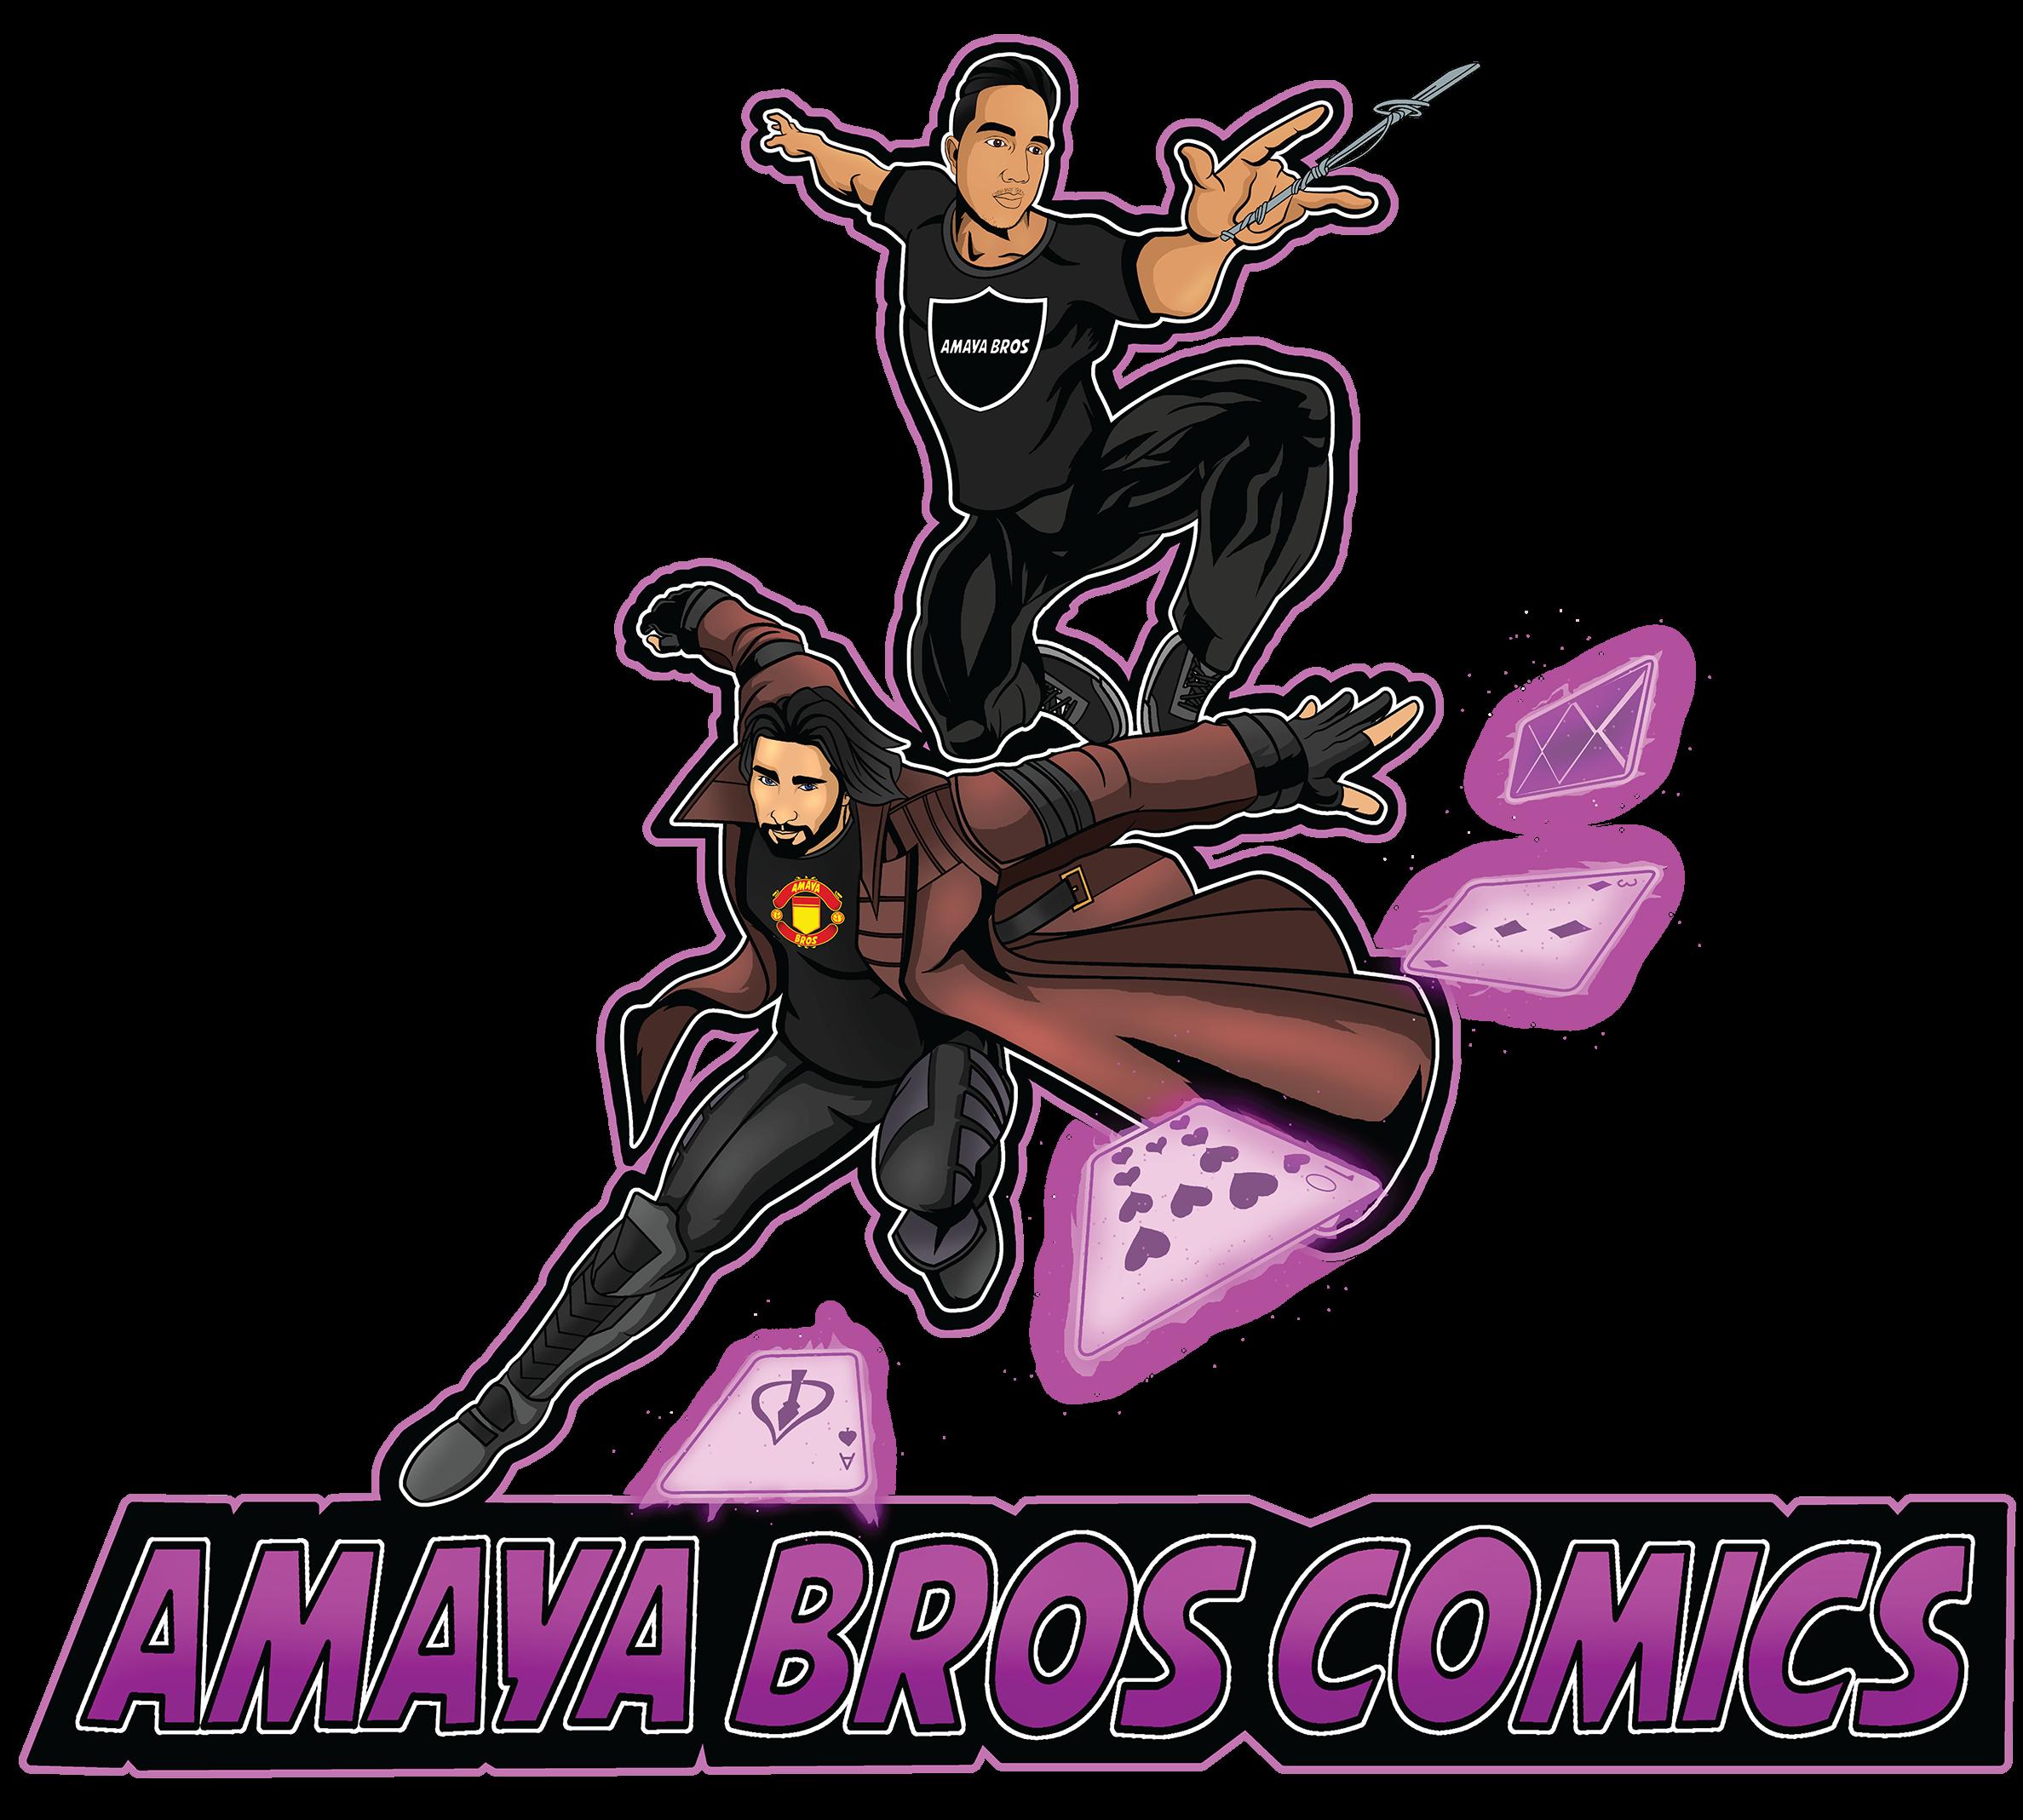 Amaya Bros. Comics